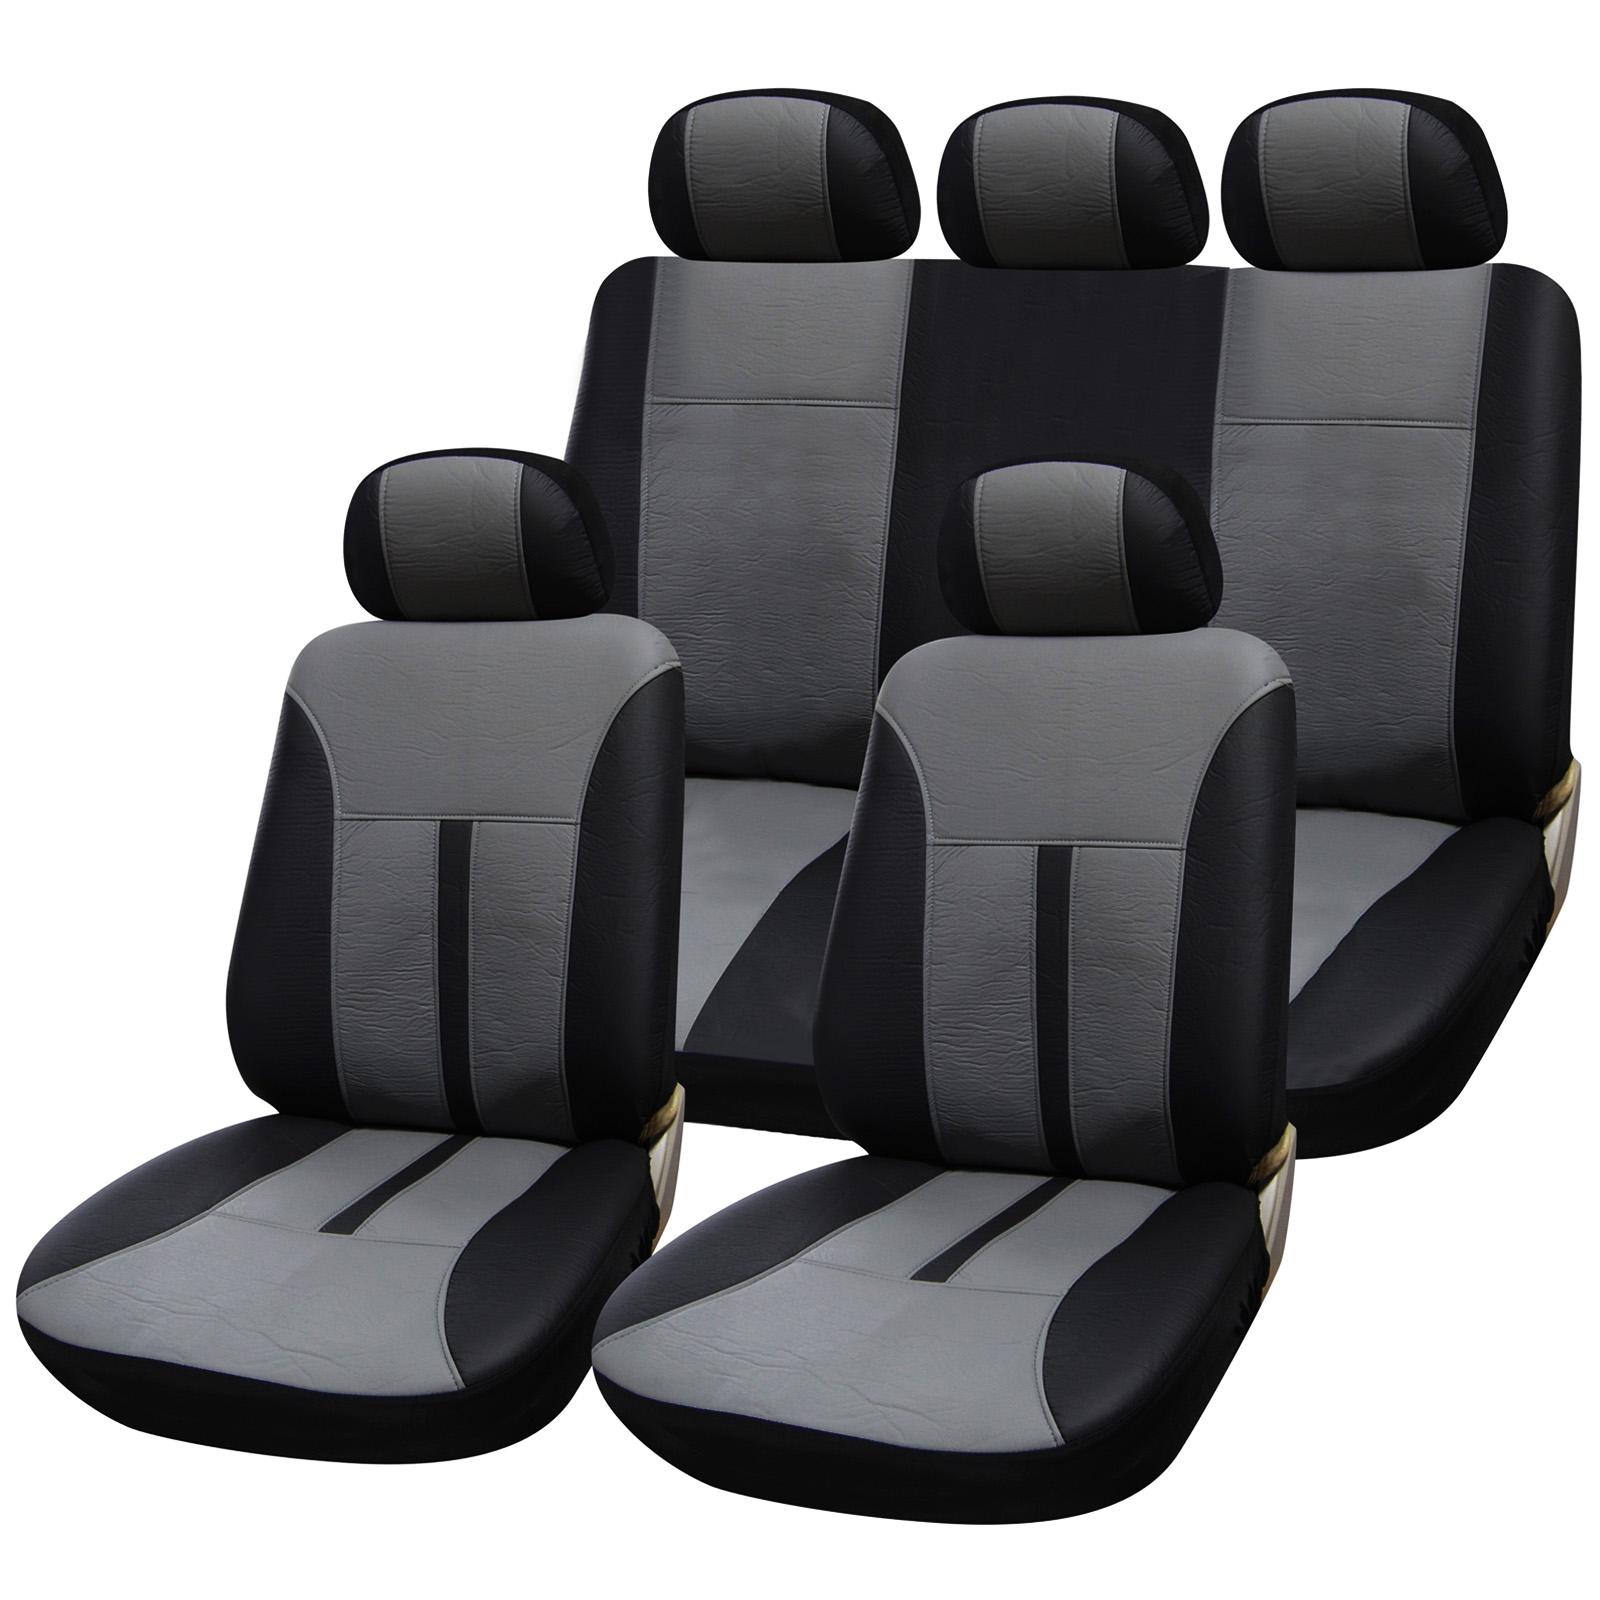 sitzbez ge auto schonbez ge sitzbezug schonbezug universal schoner farbwahl 282. Black Bedroom Furniture Sets. Home Design Ideas